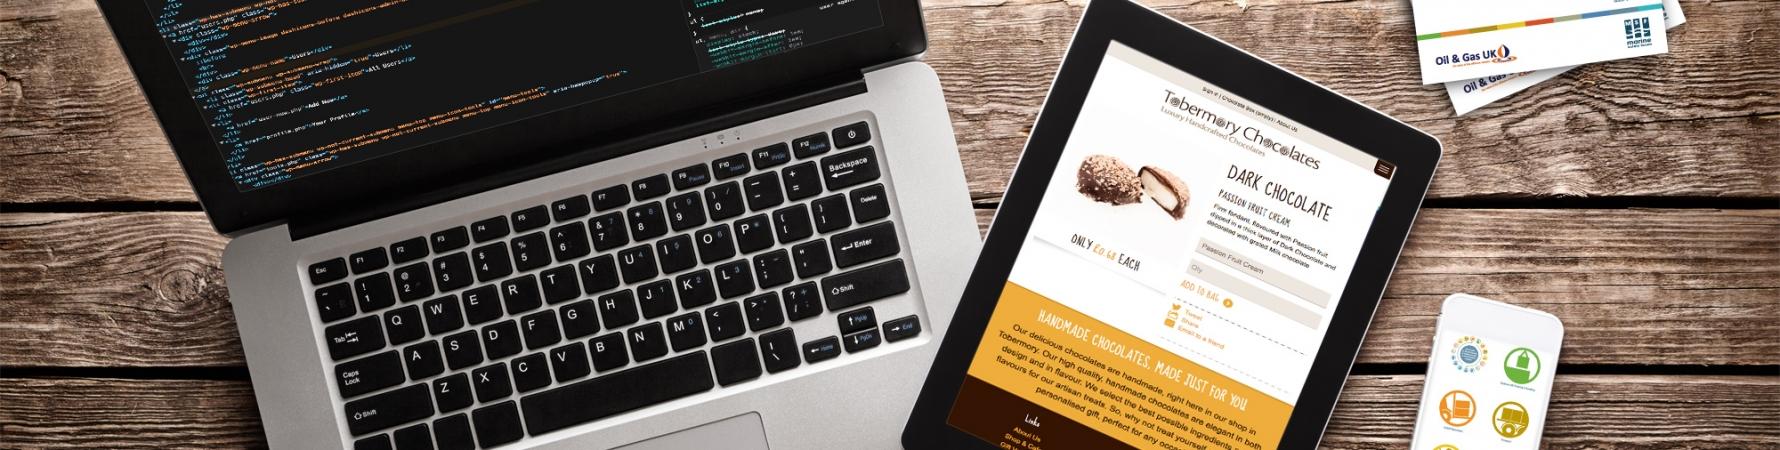 Responsive mobile website design - tobermory chocolates